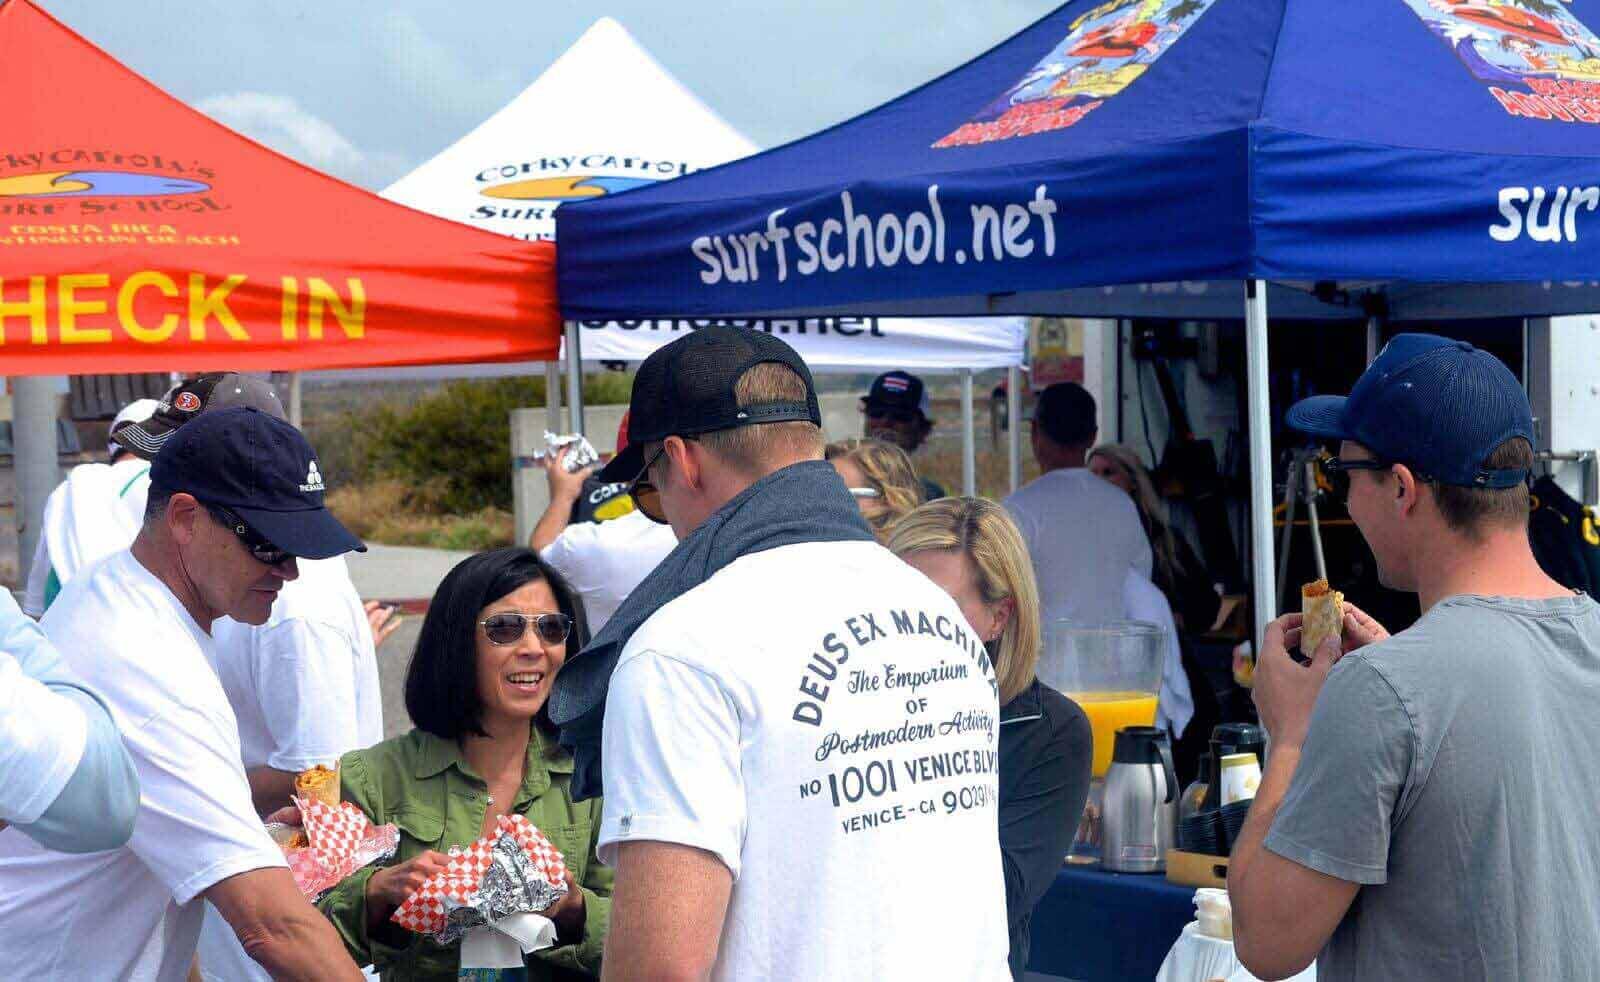 Corky Carroll's Surf School Tent